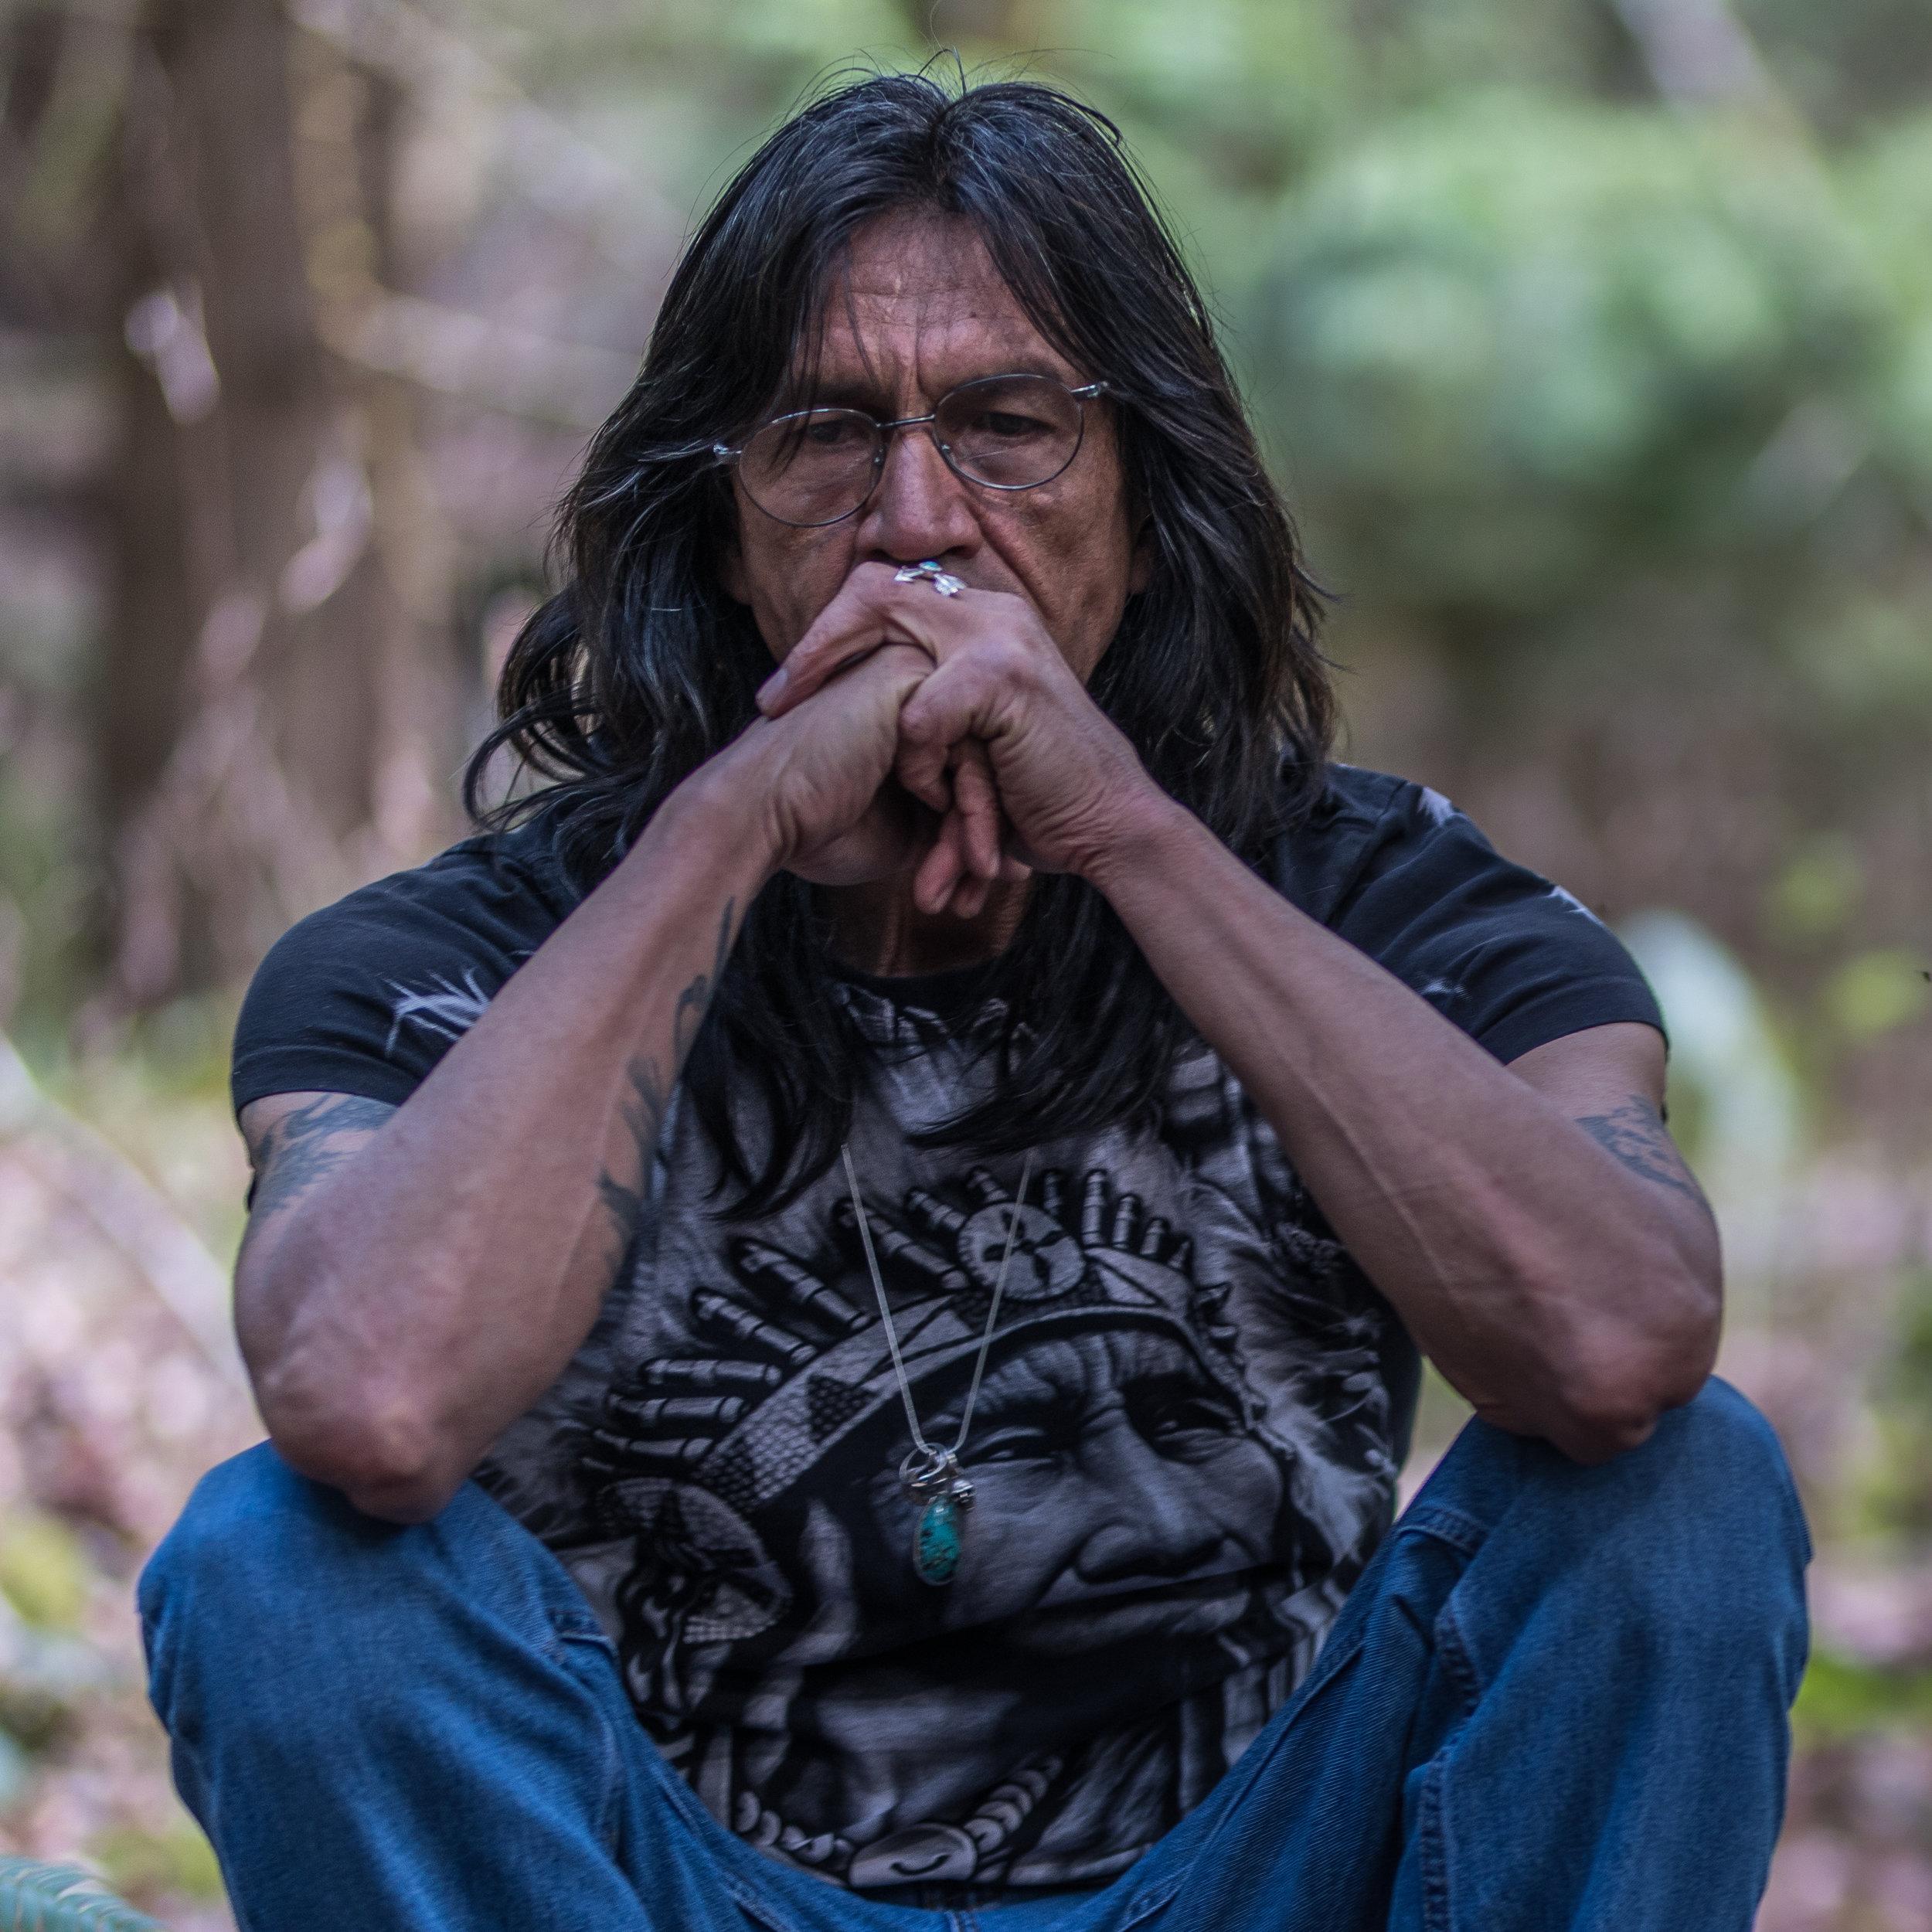 Harold Joe contemplation Dust n' Bones photo Blair Denman.jpg